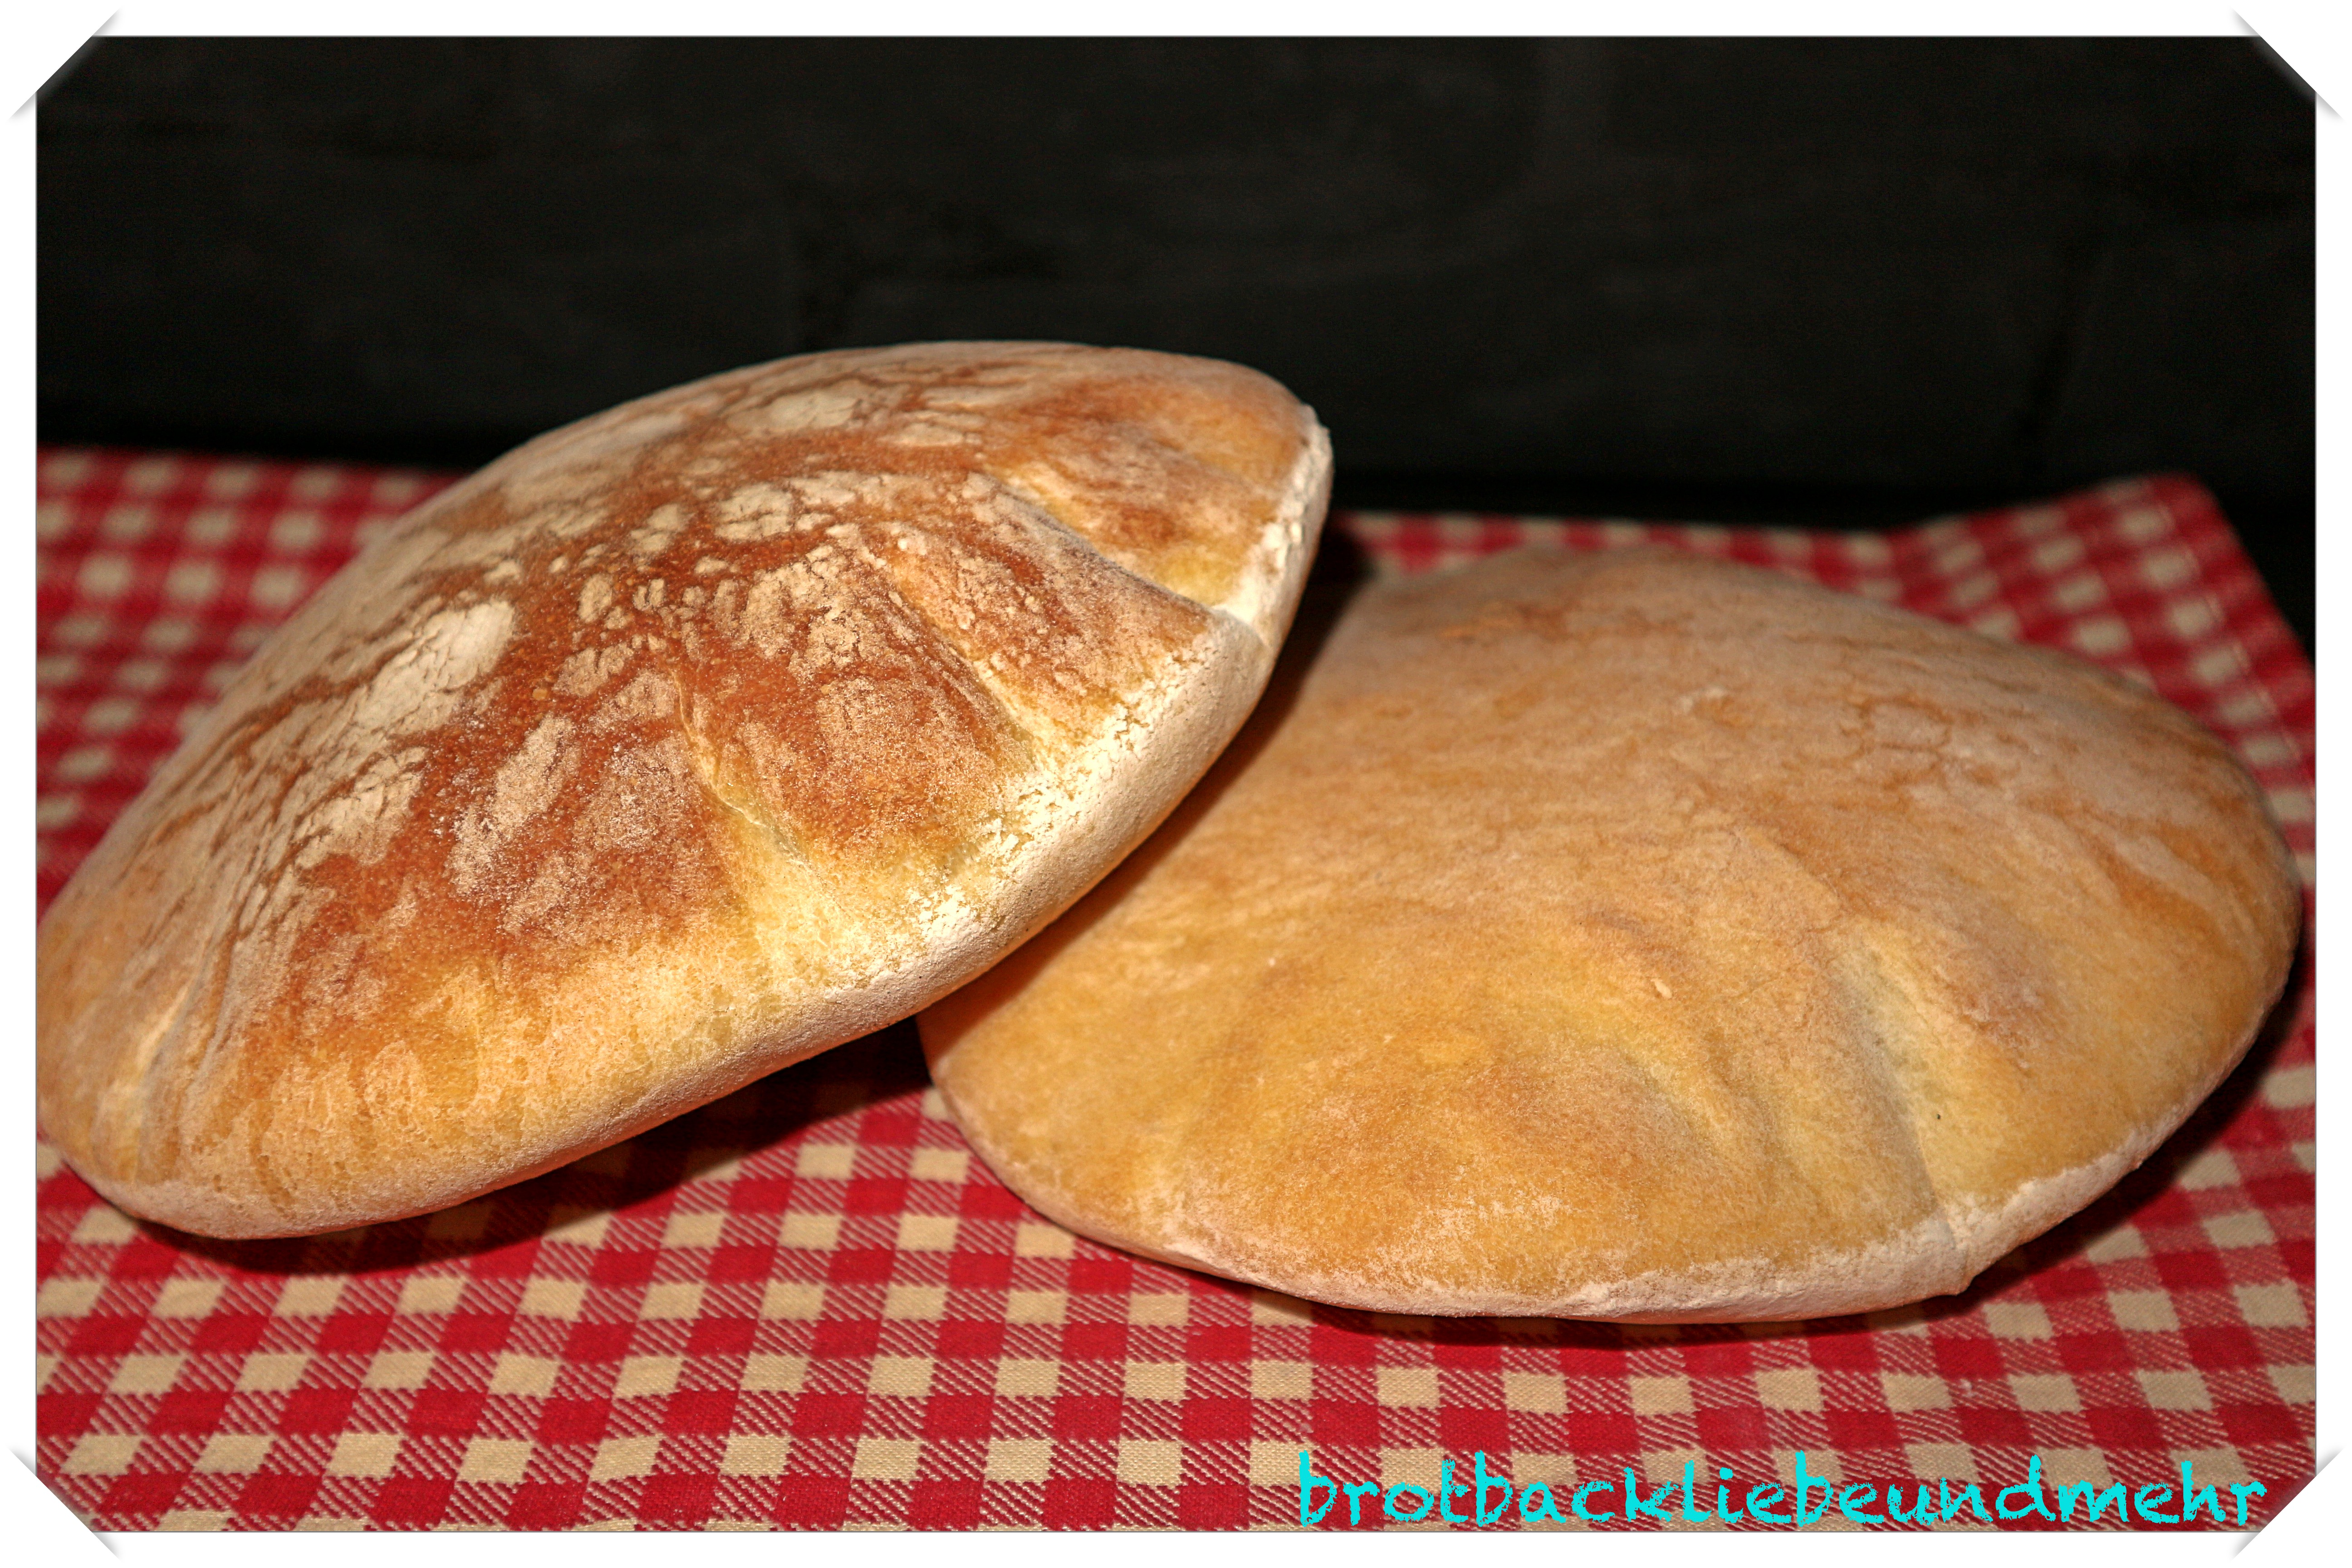 Pitabrot mit Falafel und Joghurtsoße